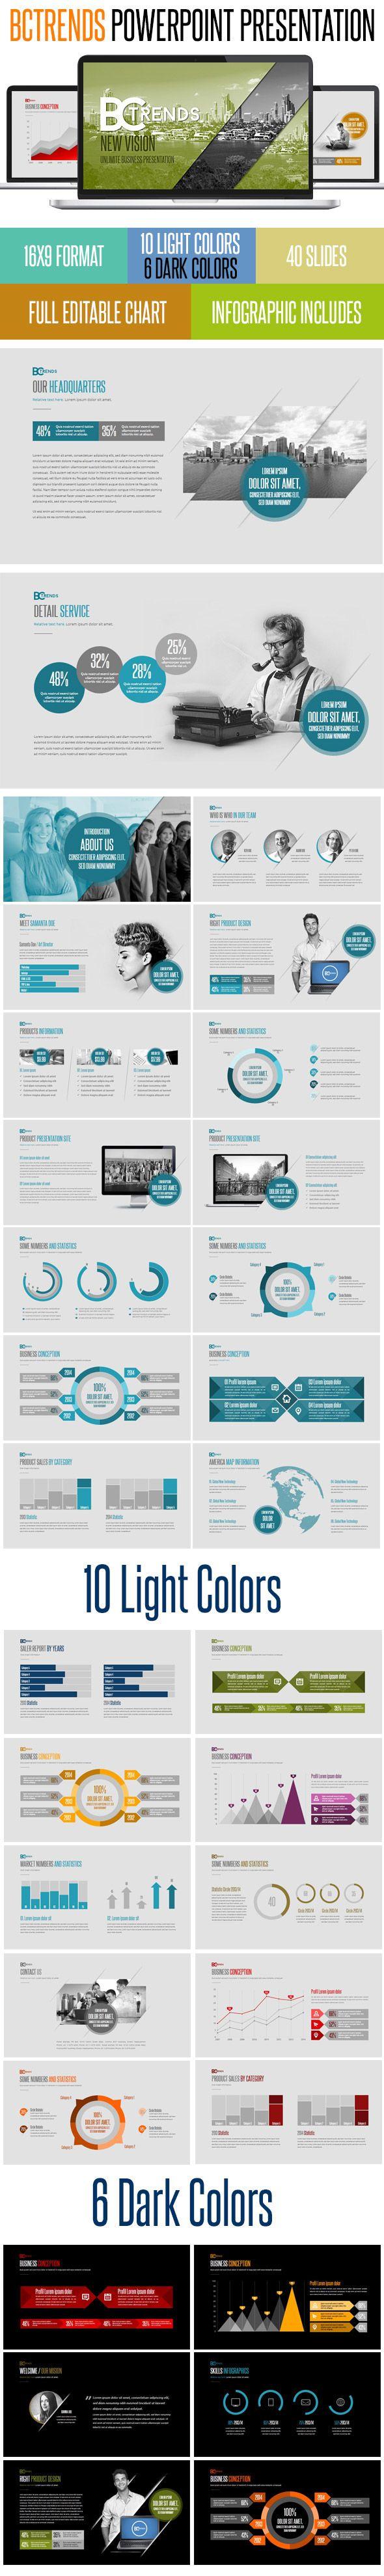 Powerpoint Presentation BC Trends on Behance